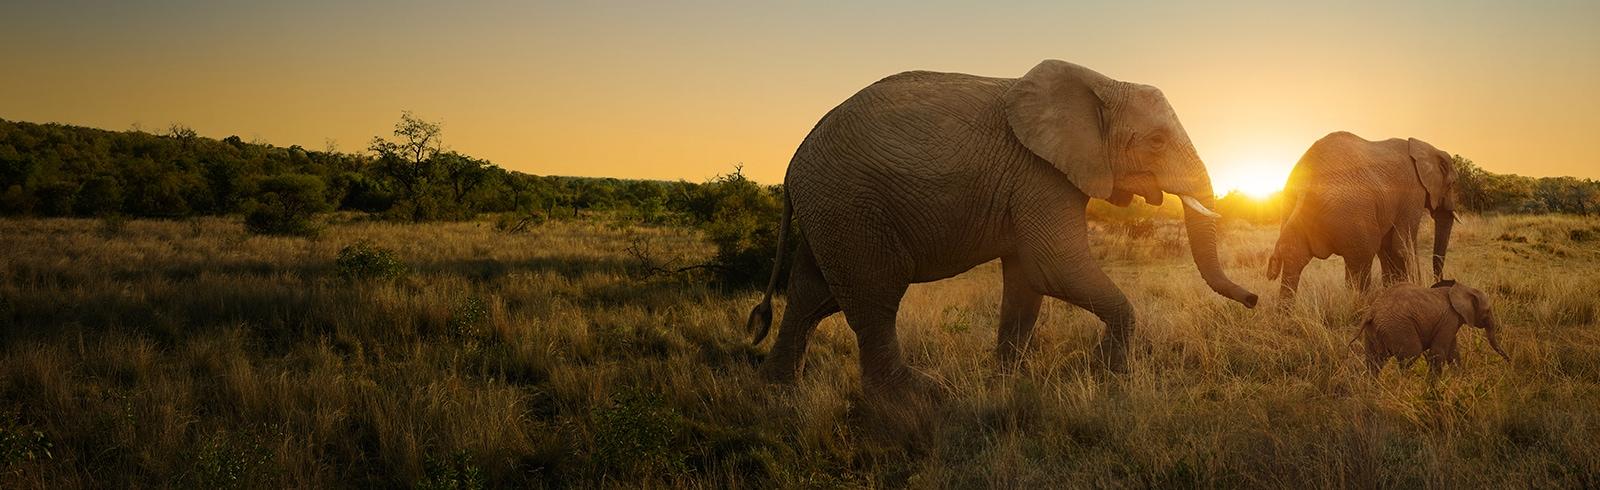 Hk sunset elephants superless